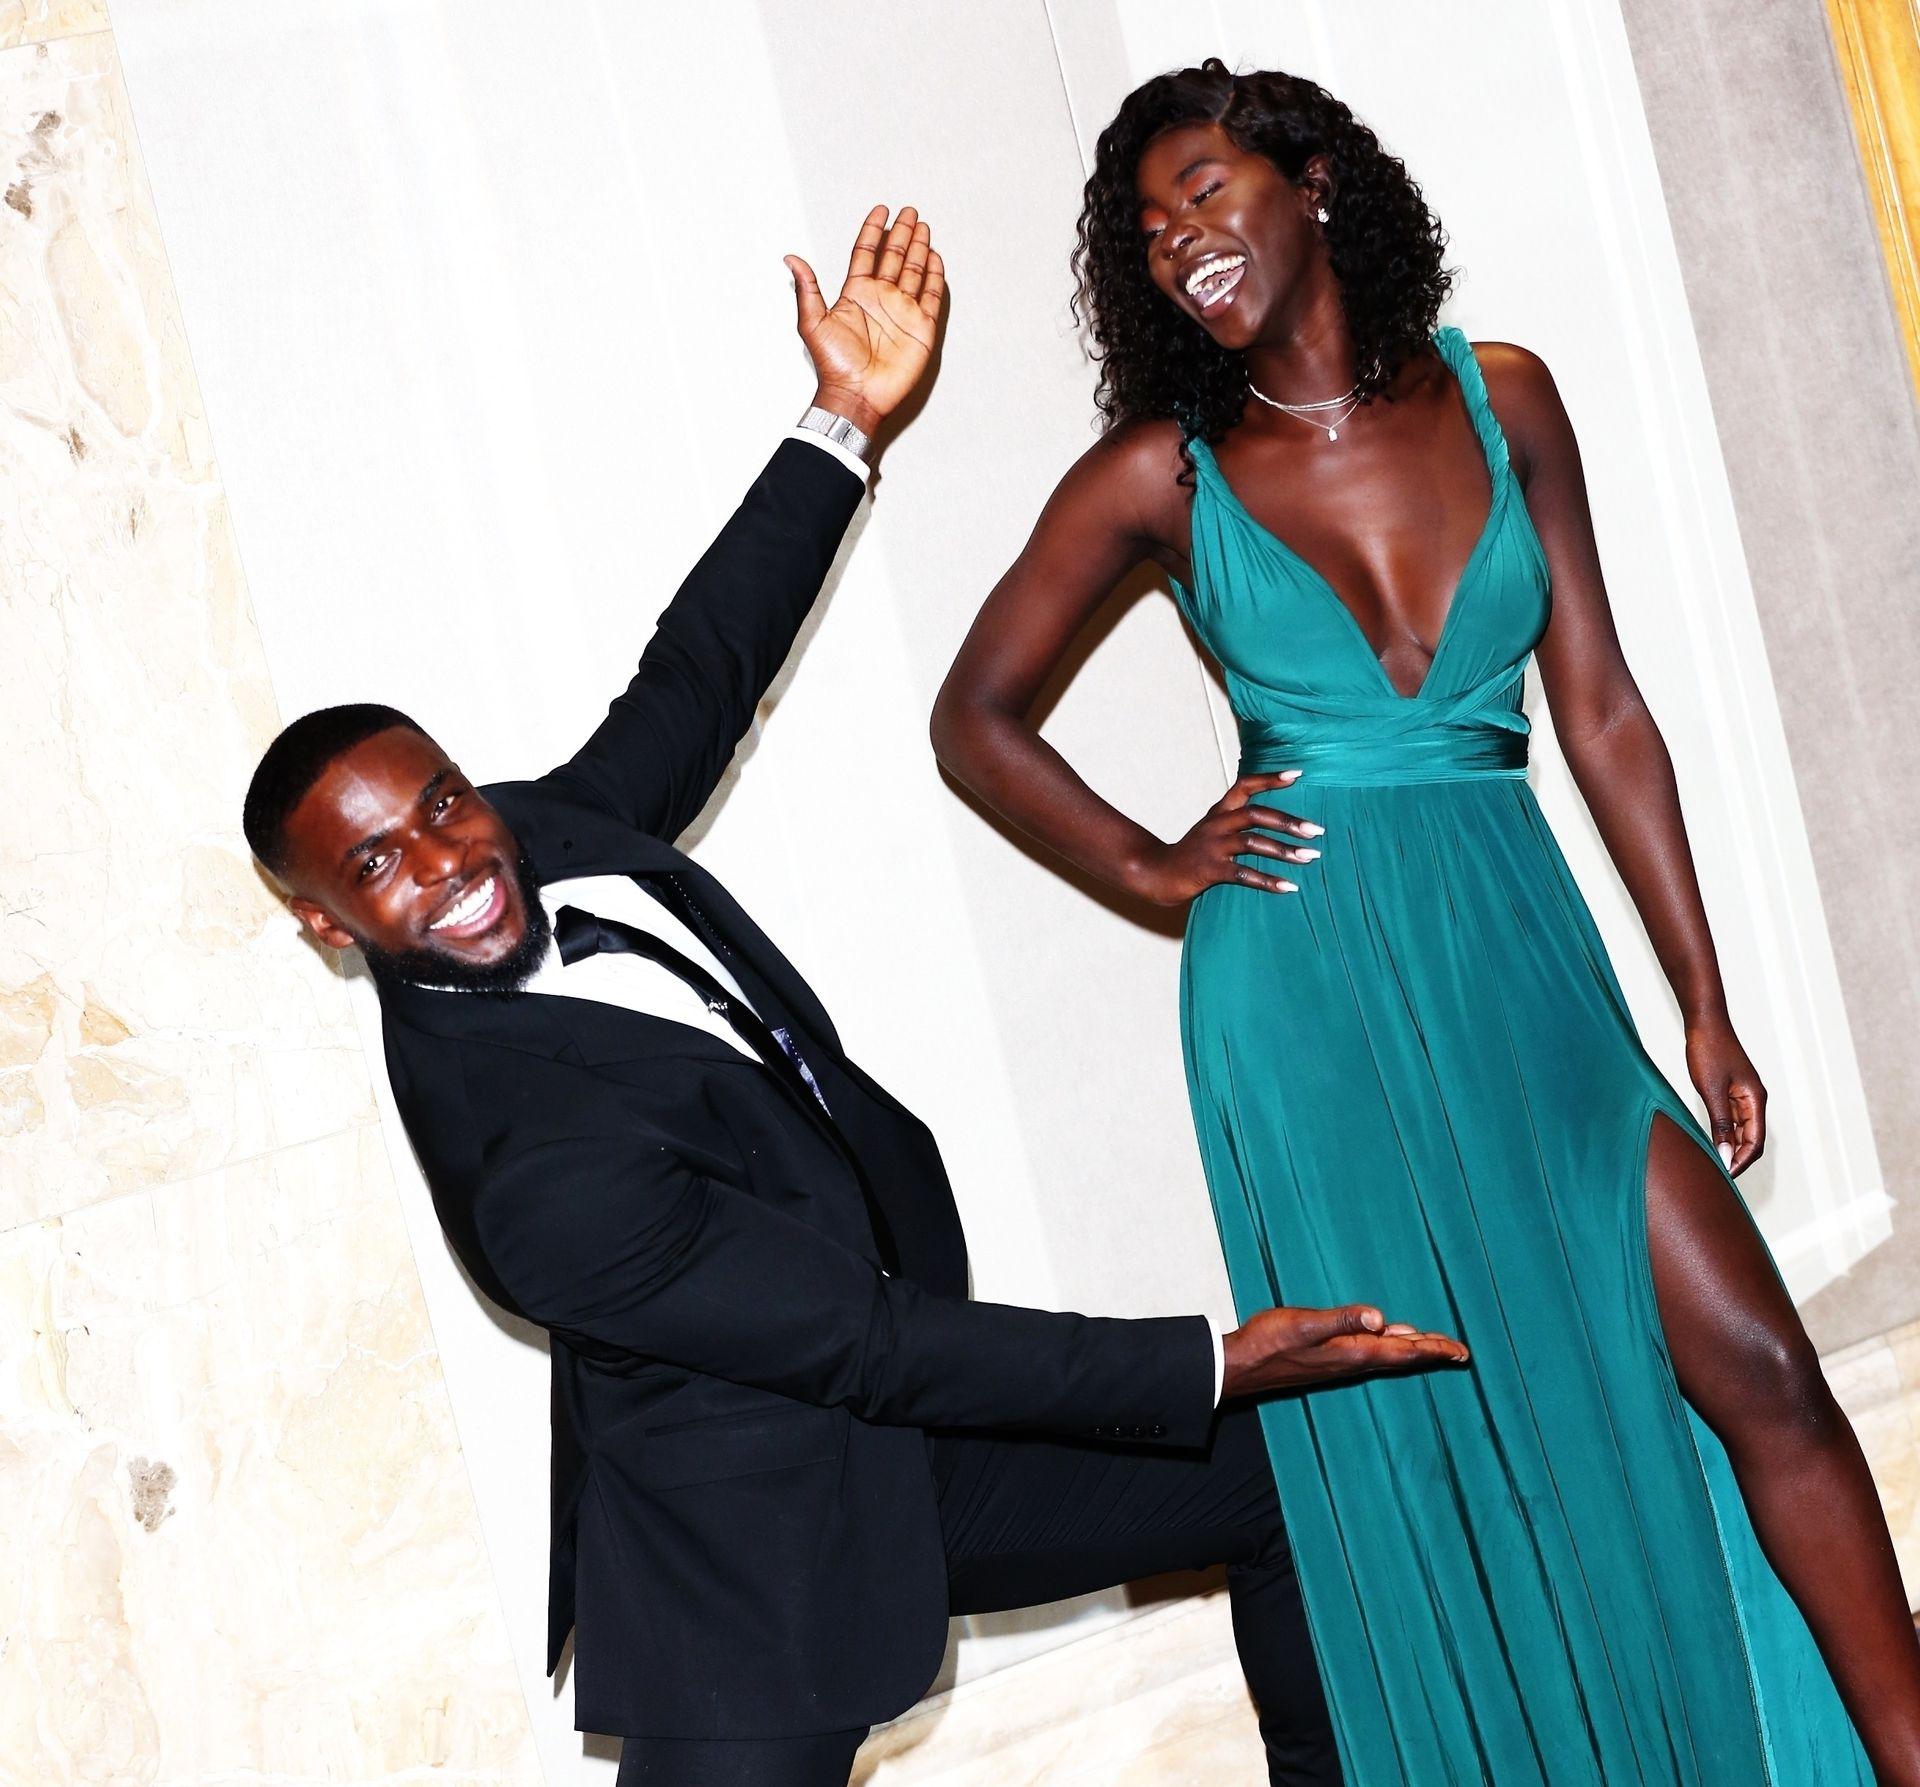 Mike Boateng & Priscilla Anyabu Are Seen At British Ethnic Diversity Sports Awards 0120